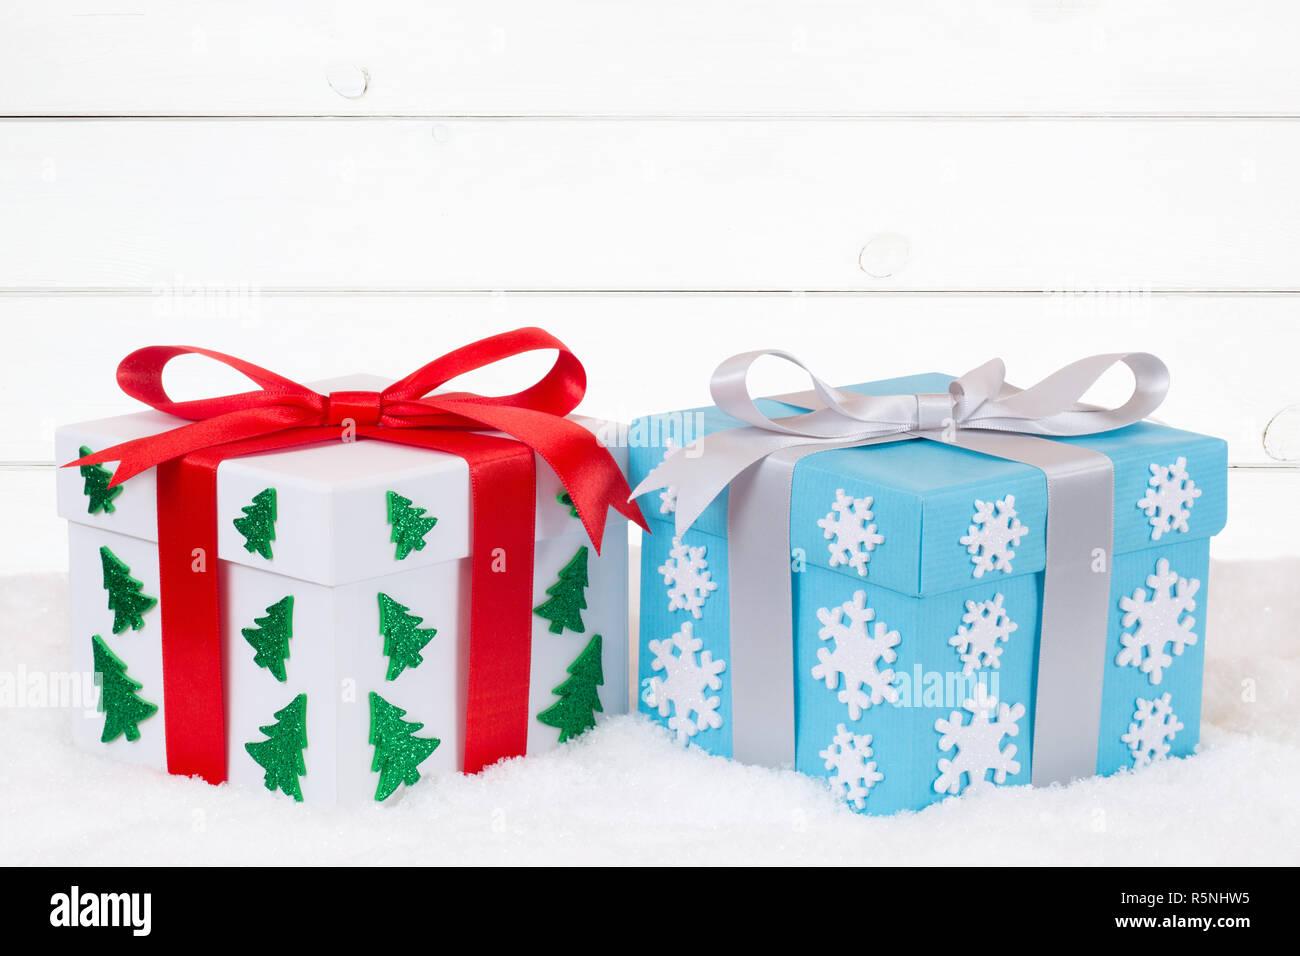 Weihnachtsgeschenke Geschenke.Weihnachtsgeschenke Geschenke Schenken Weihnachten Bescherung Holz